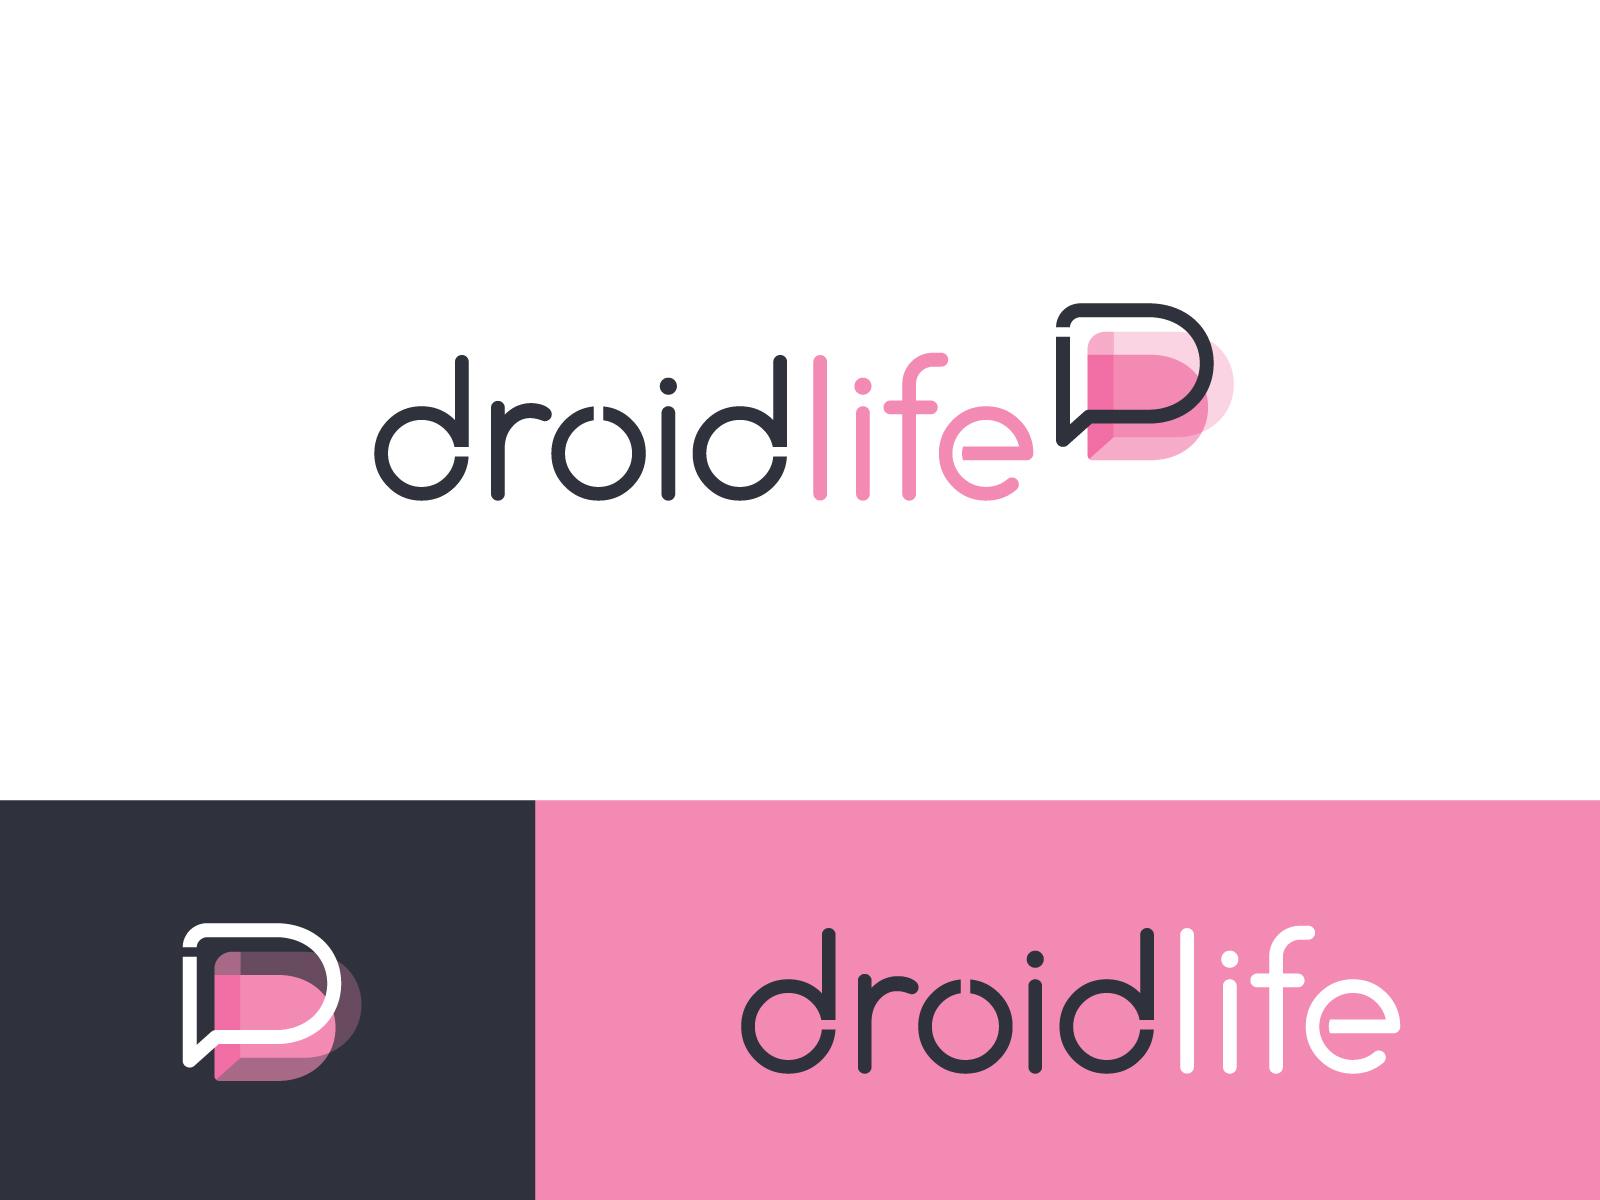 Droidlife logos